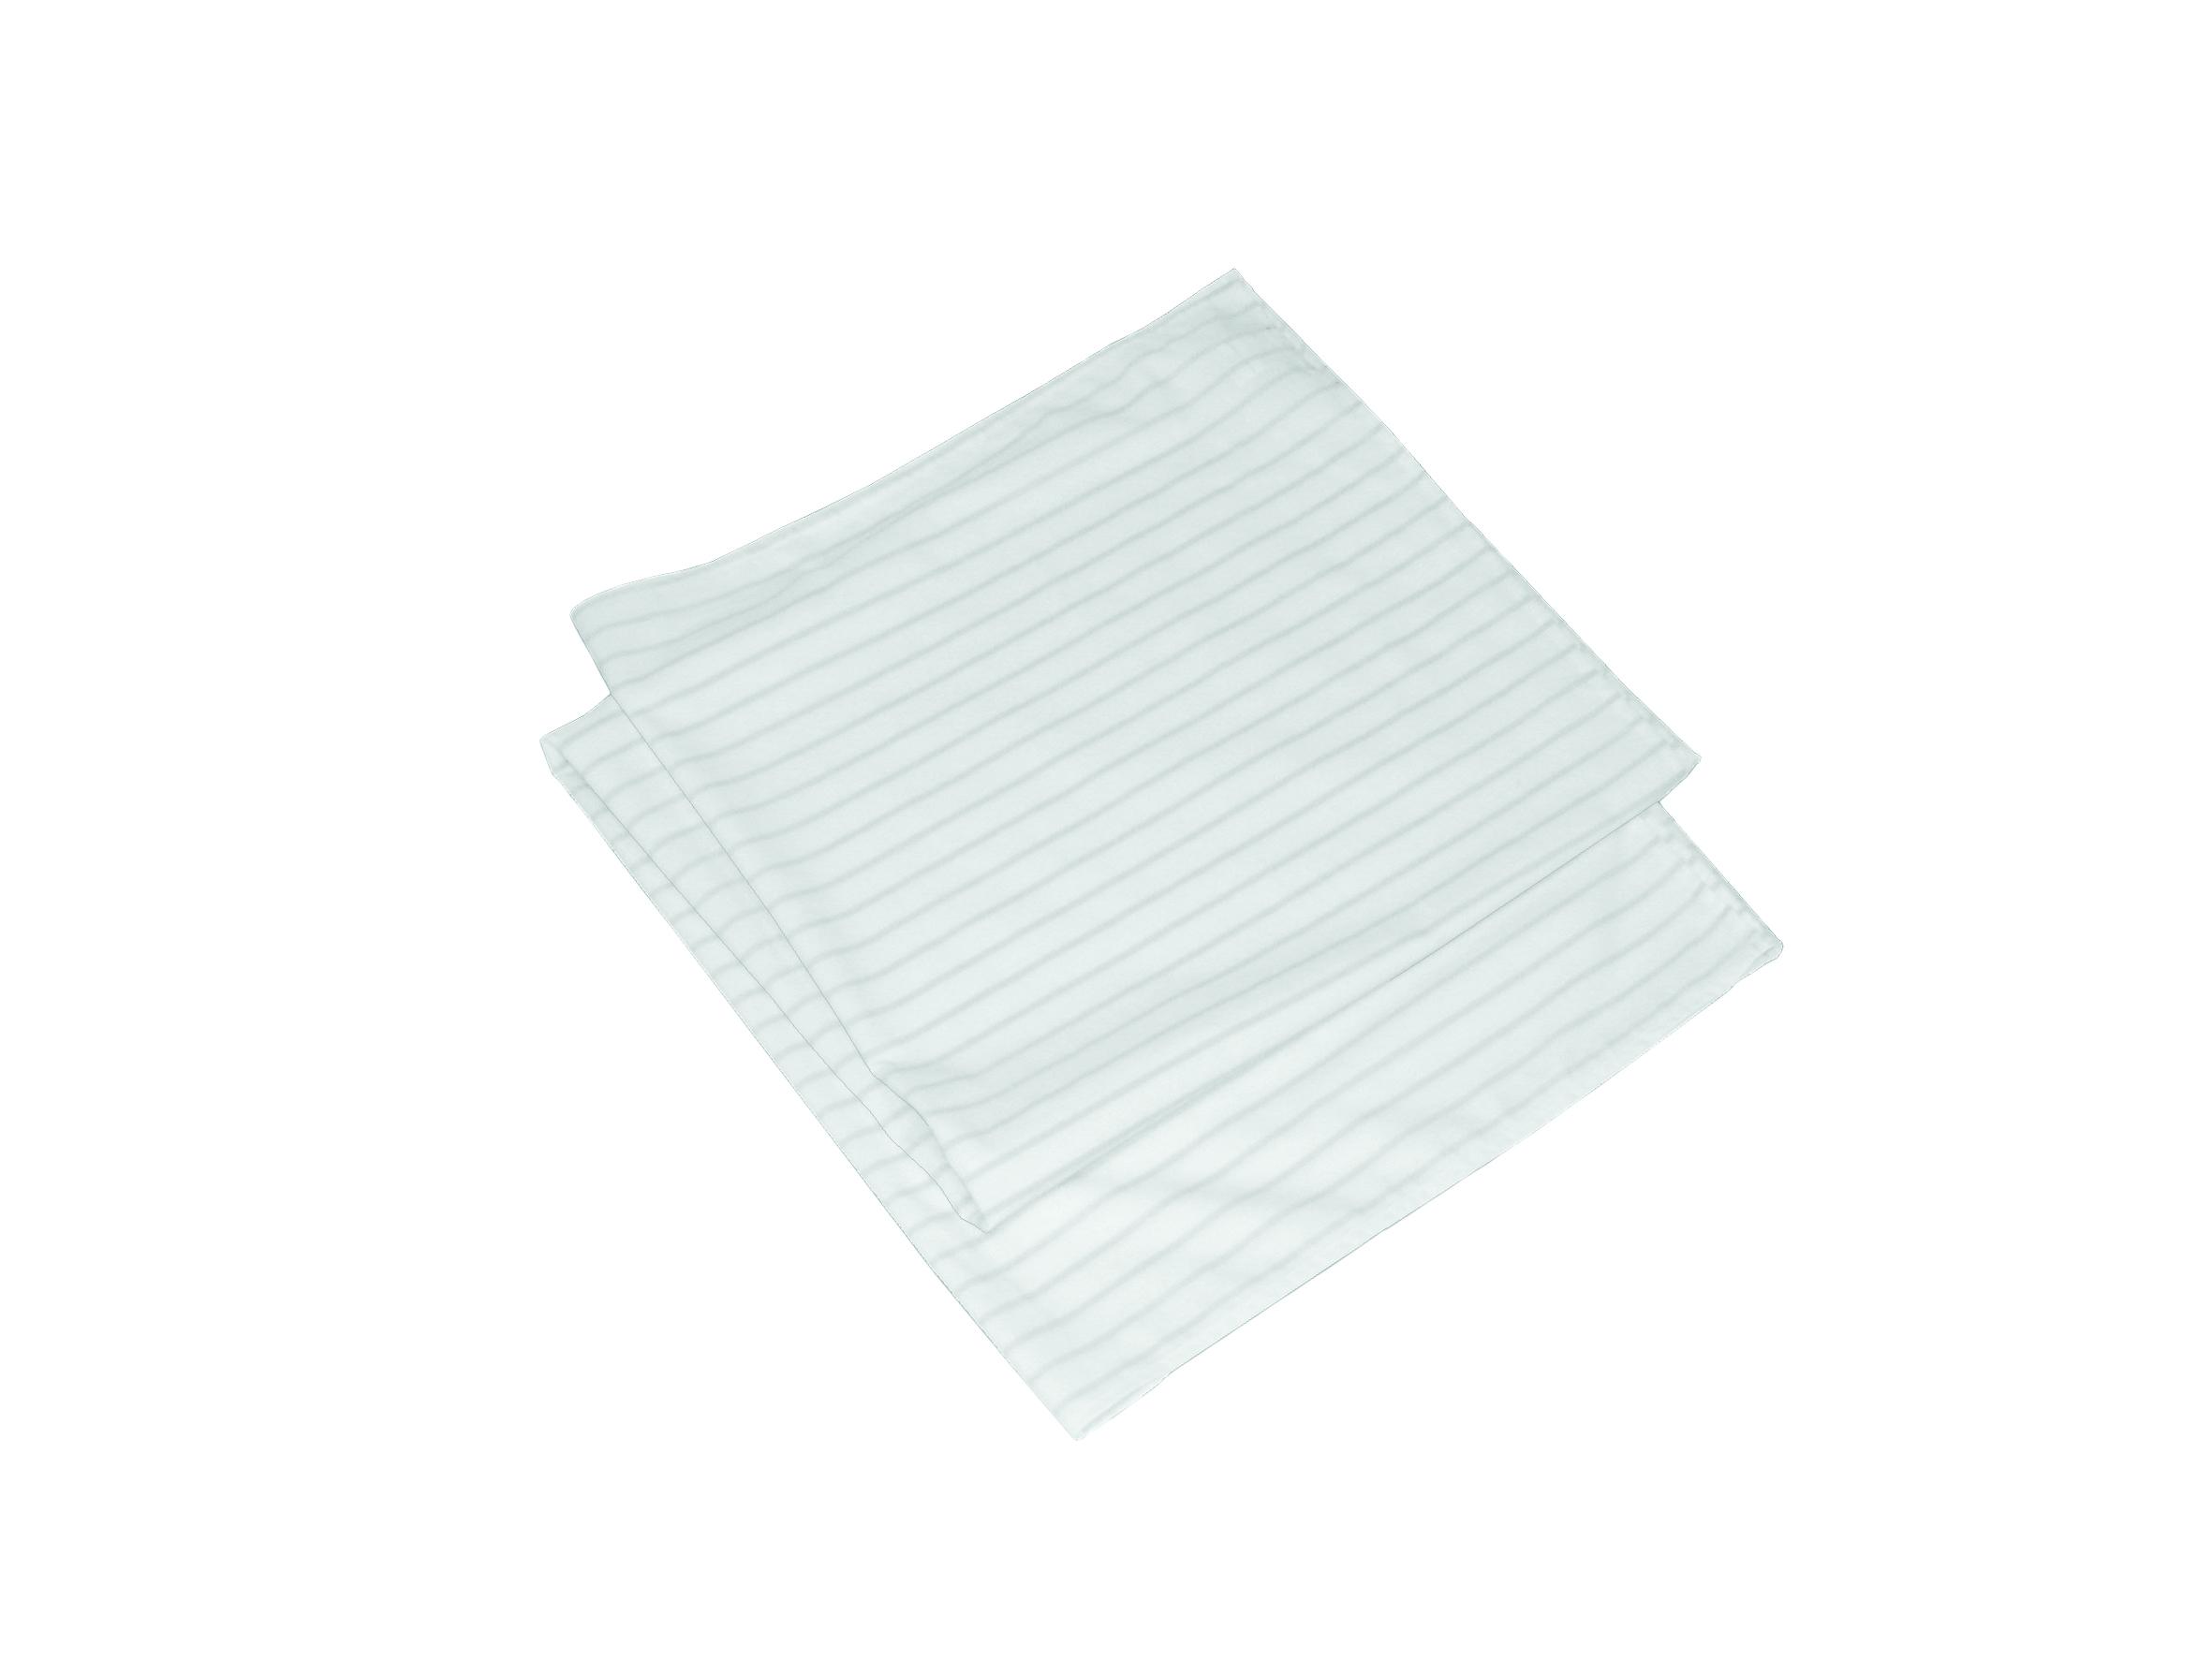 WendyLett Flat Base Sheet - Various sizes are available